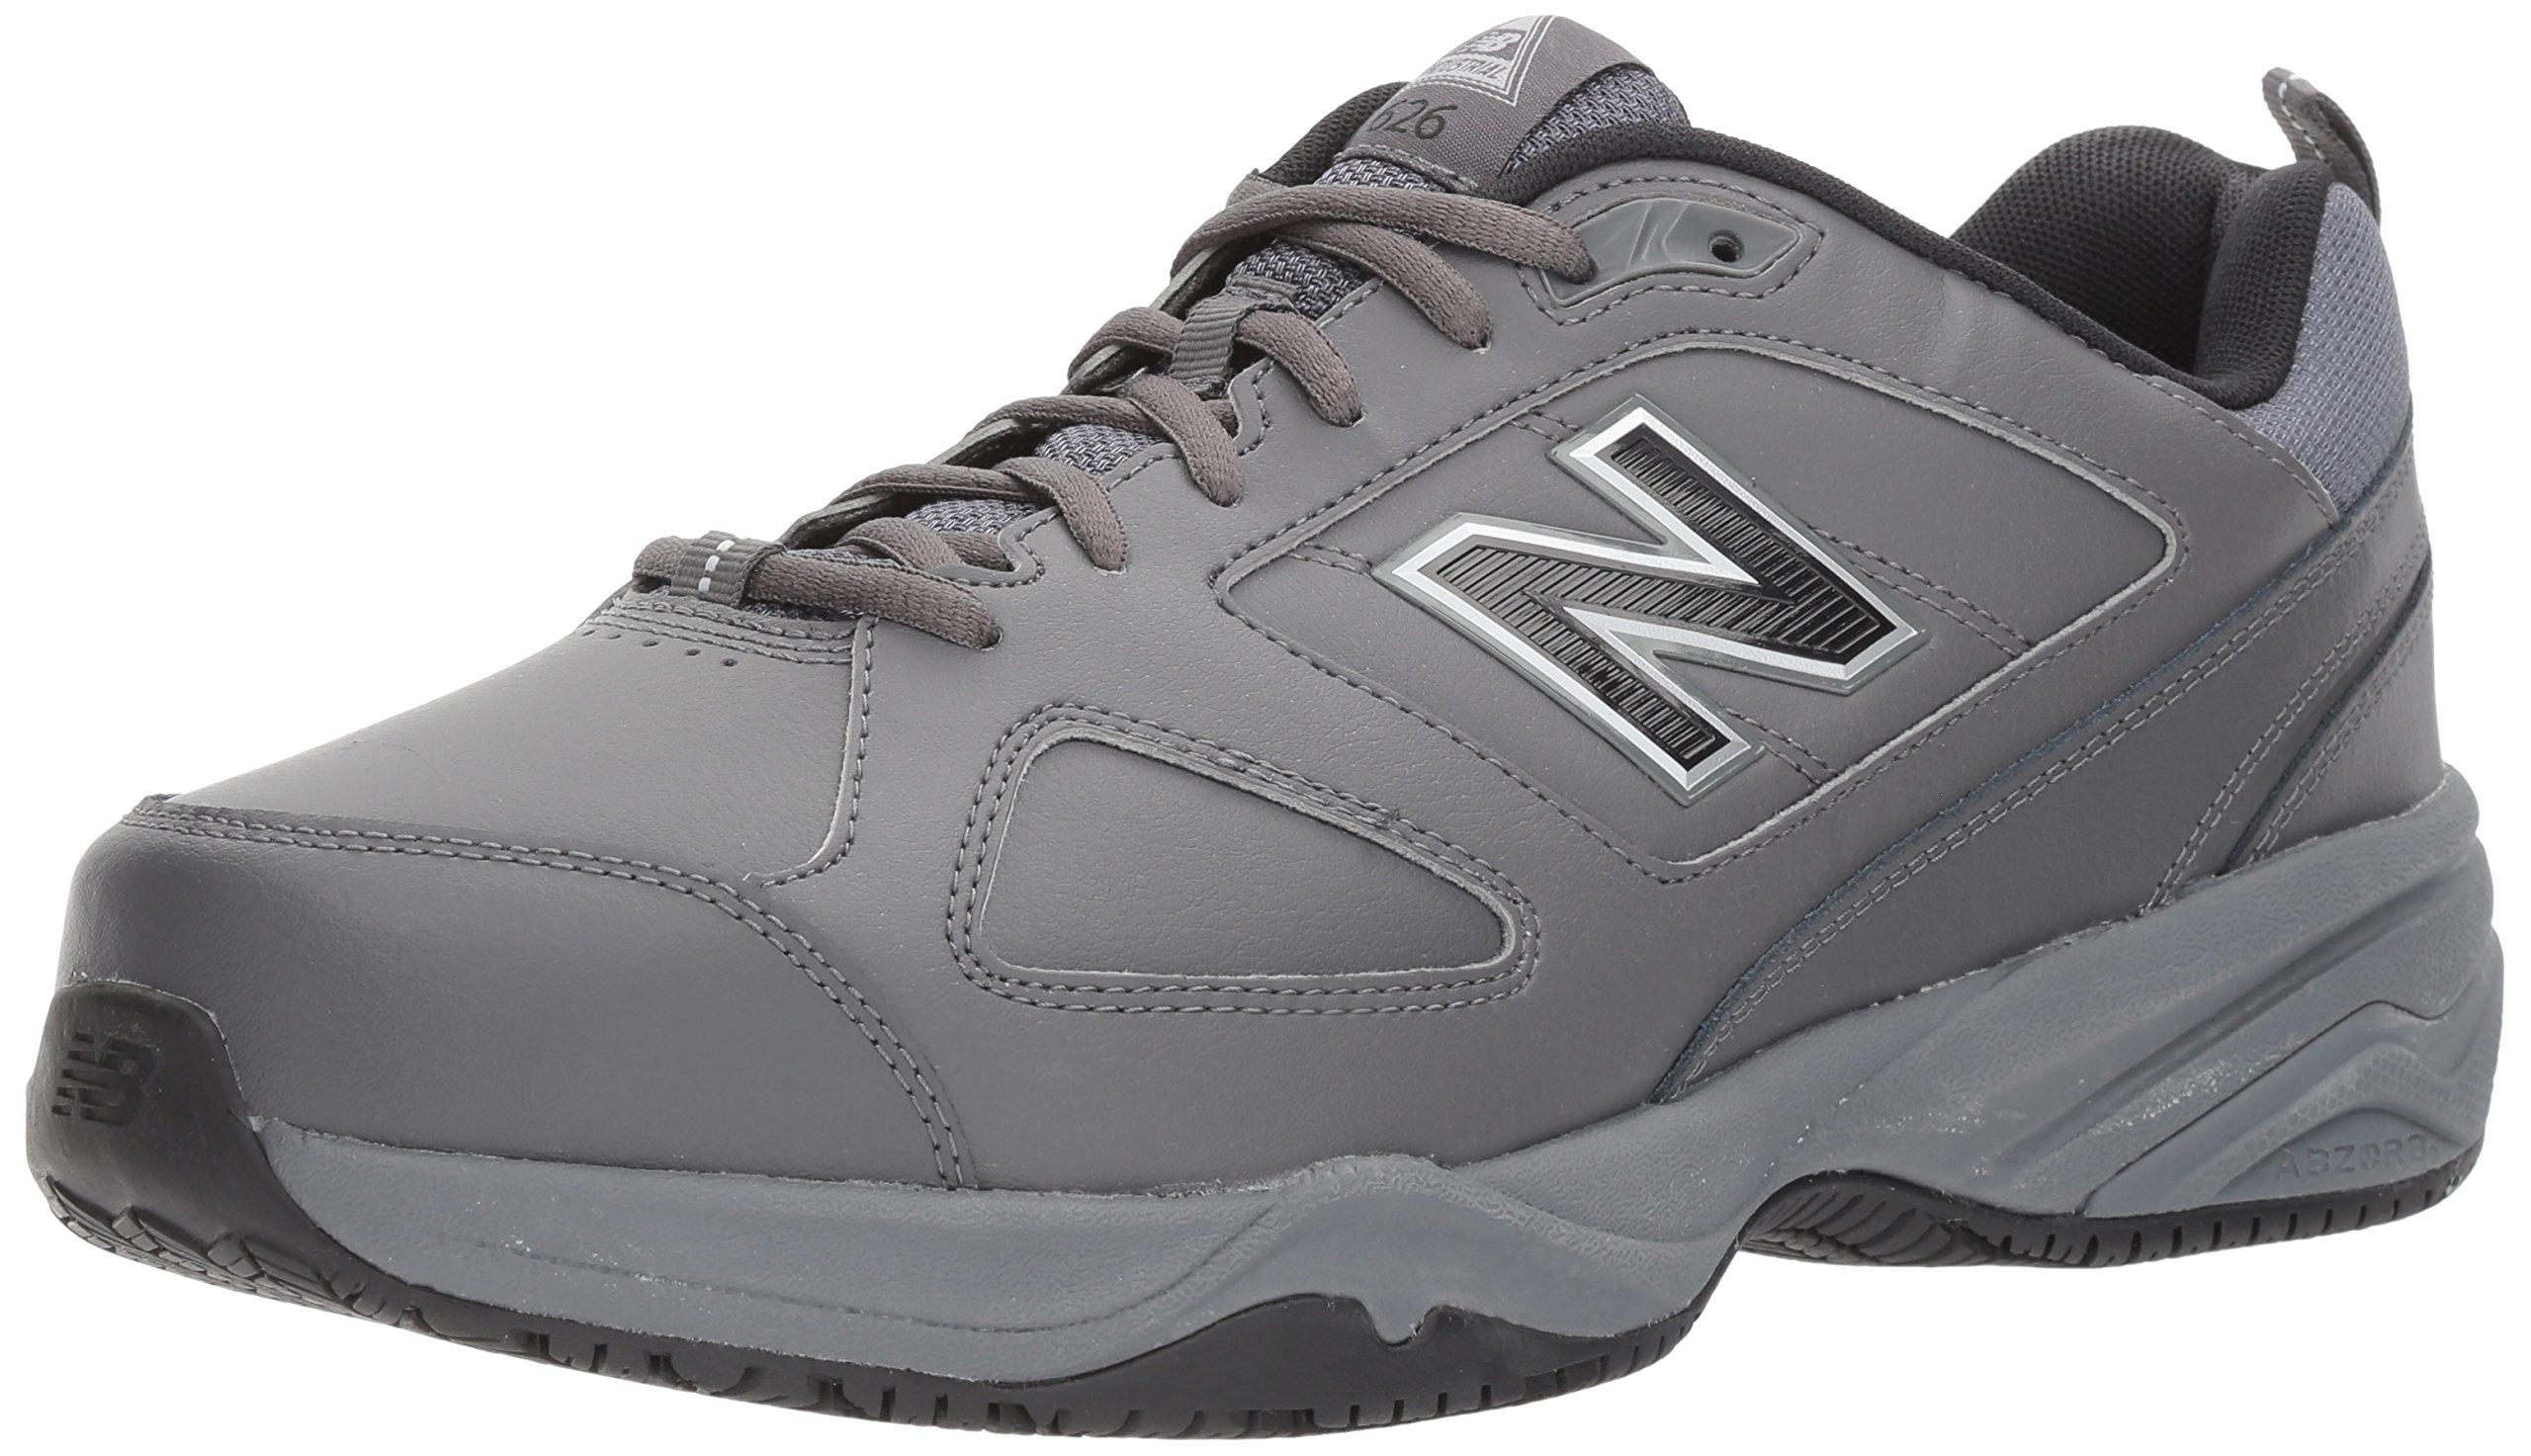 New Balance Men's MID626v2 Work Training Shoe, Grey/Black, 14 4E US